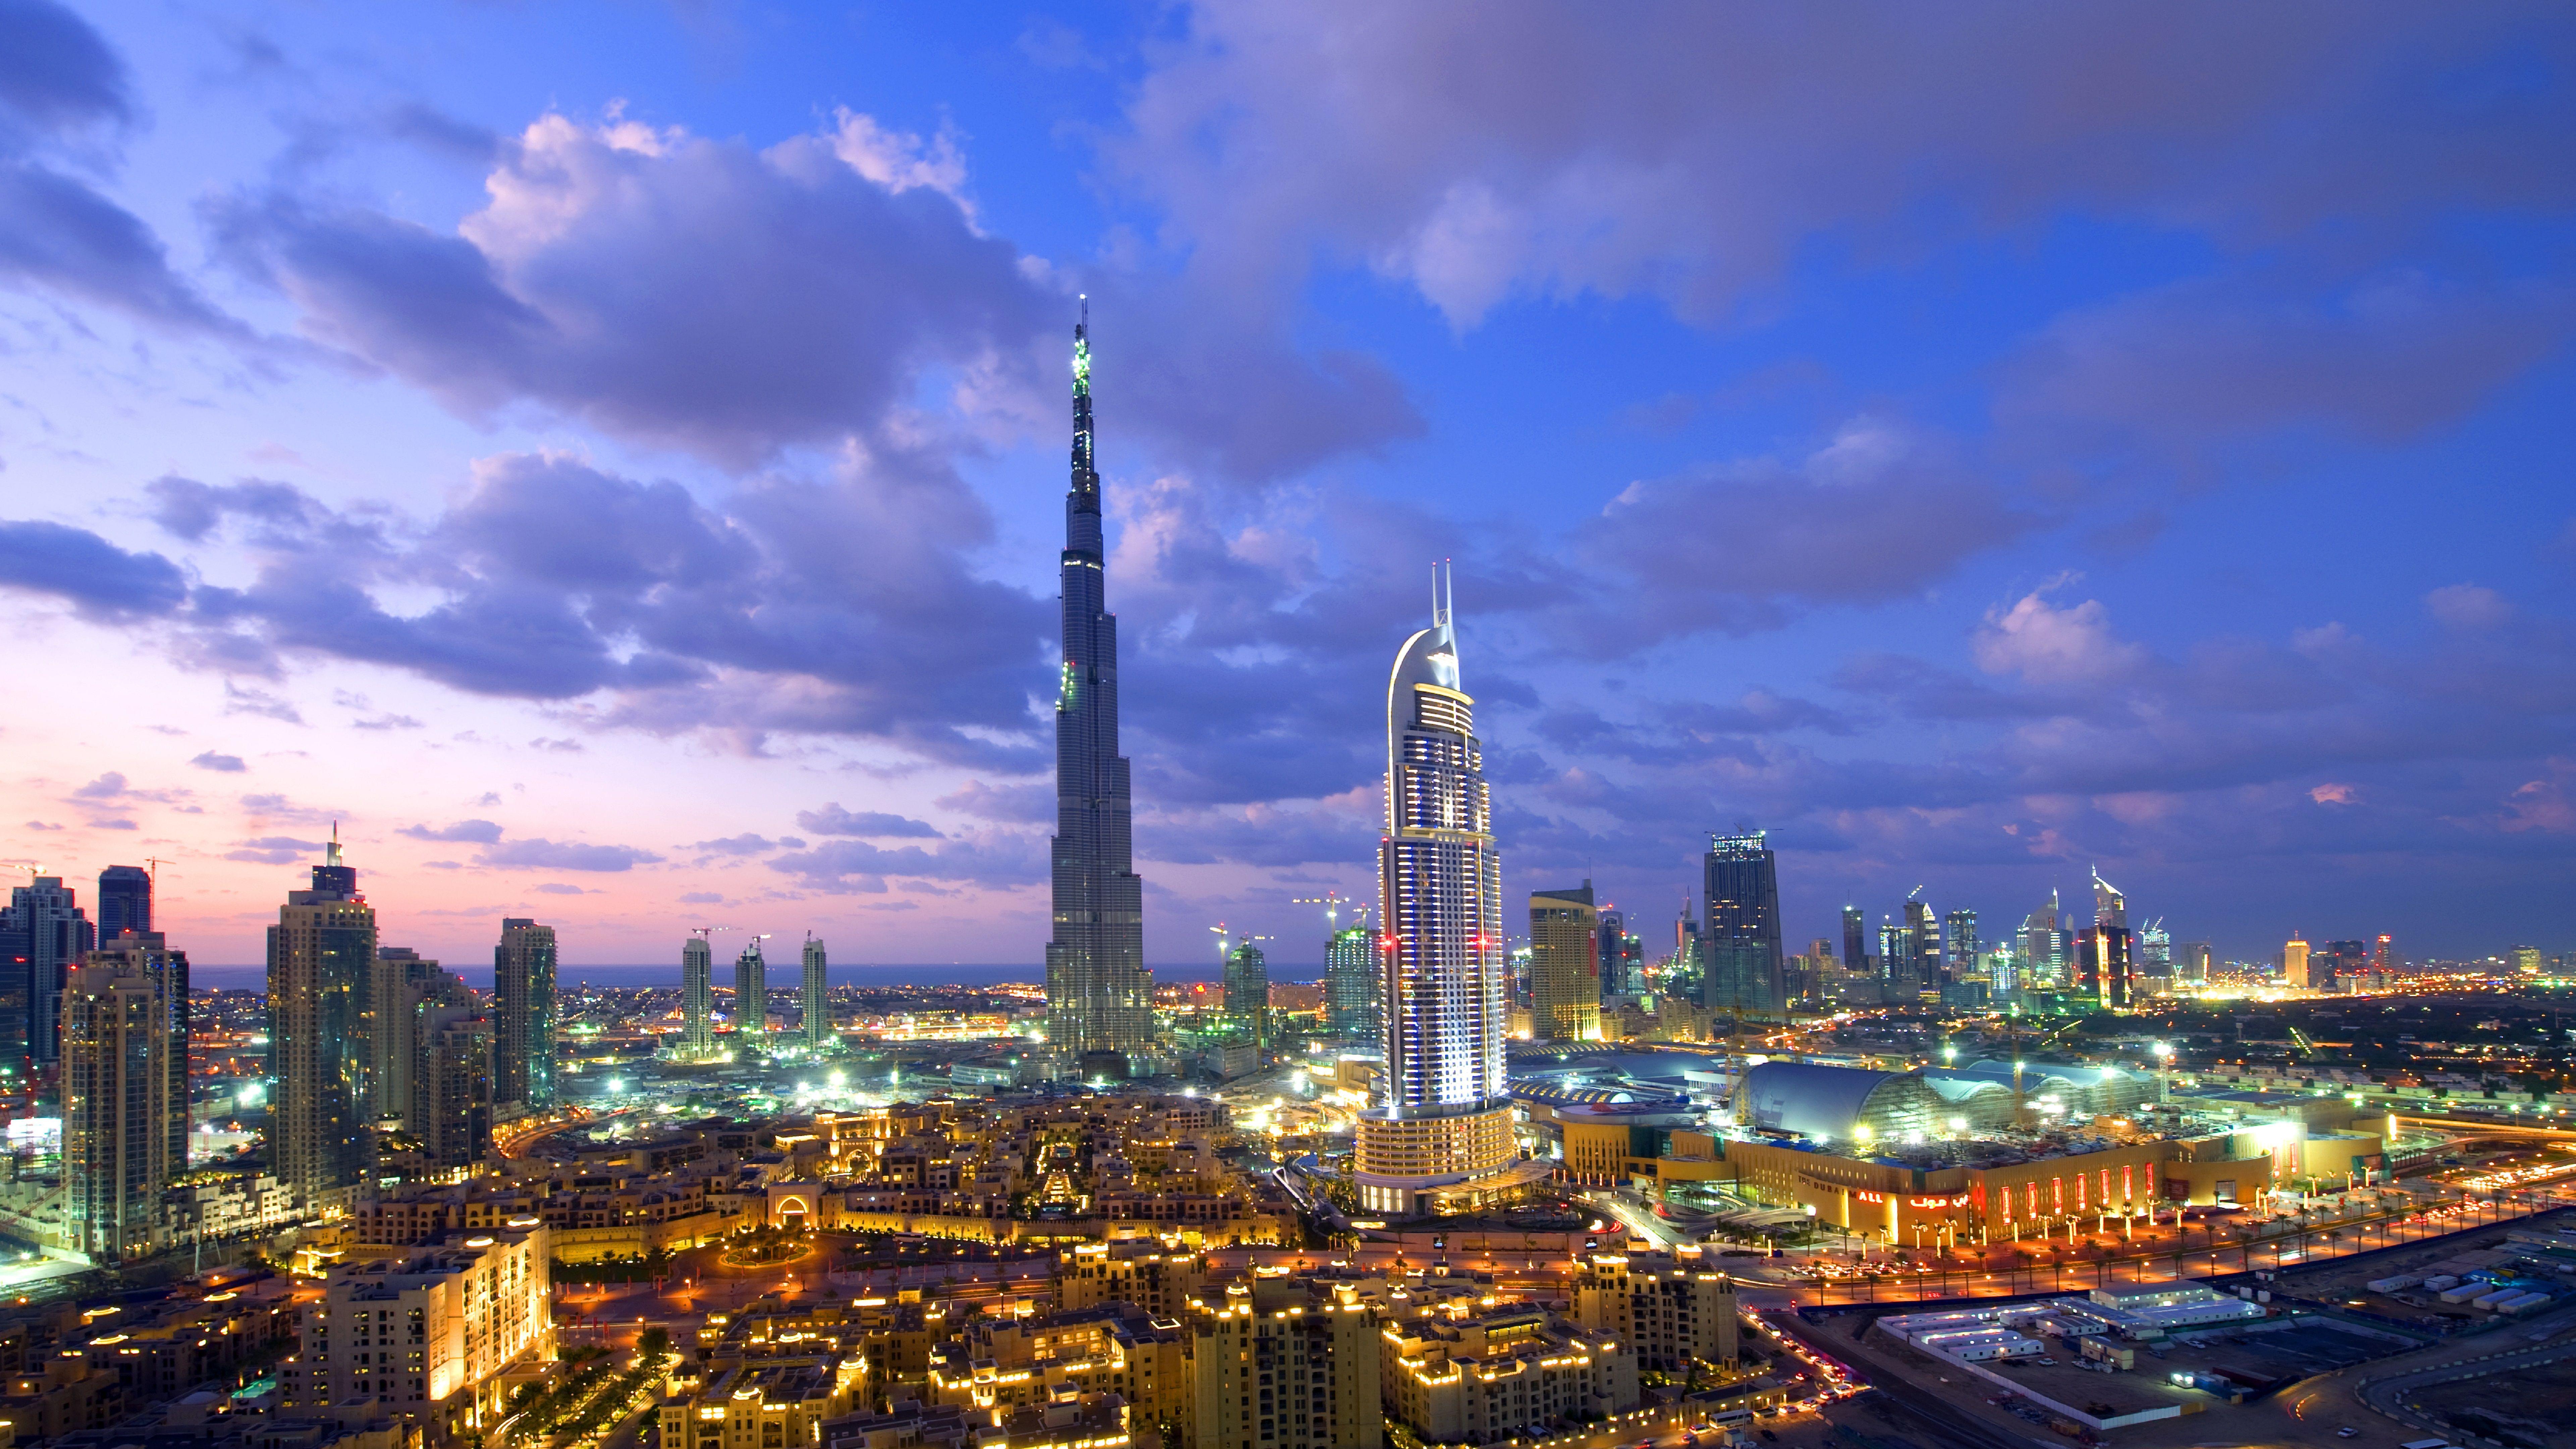 Hd Wallpapers For Pc Burj Khalifa